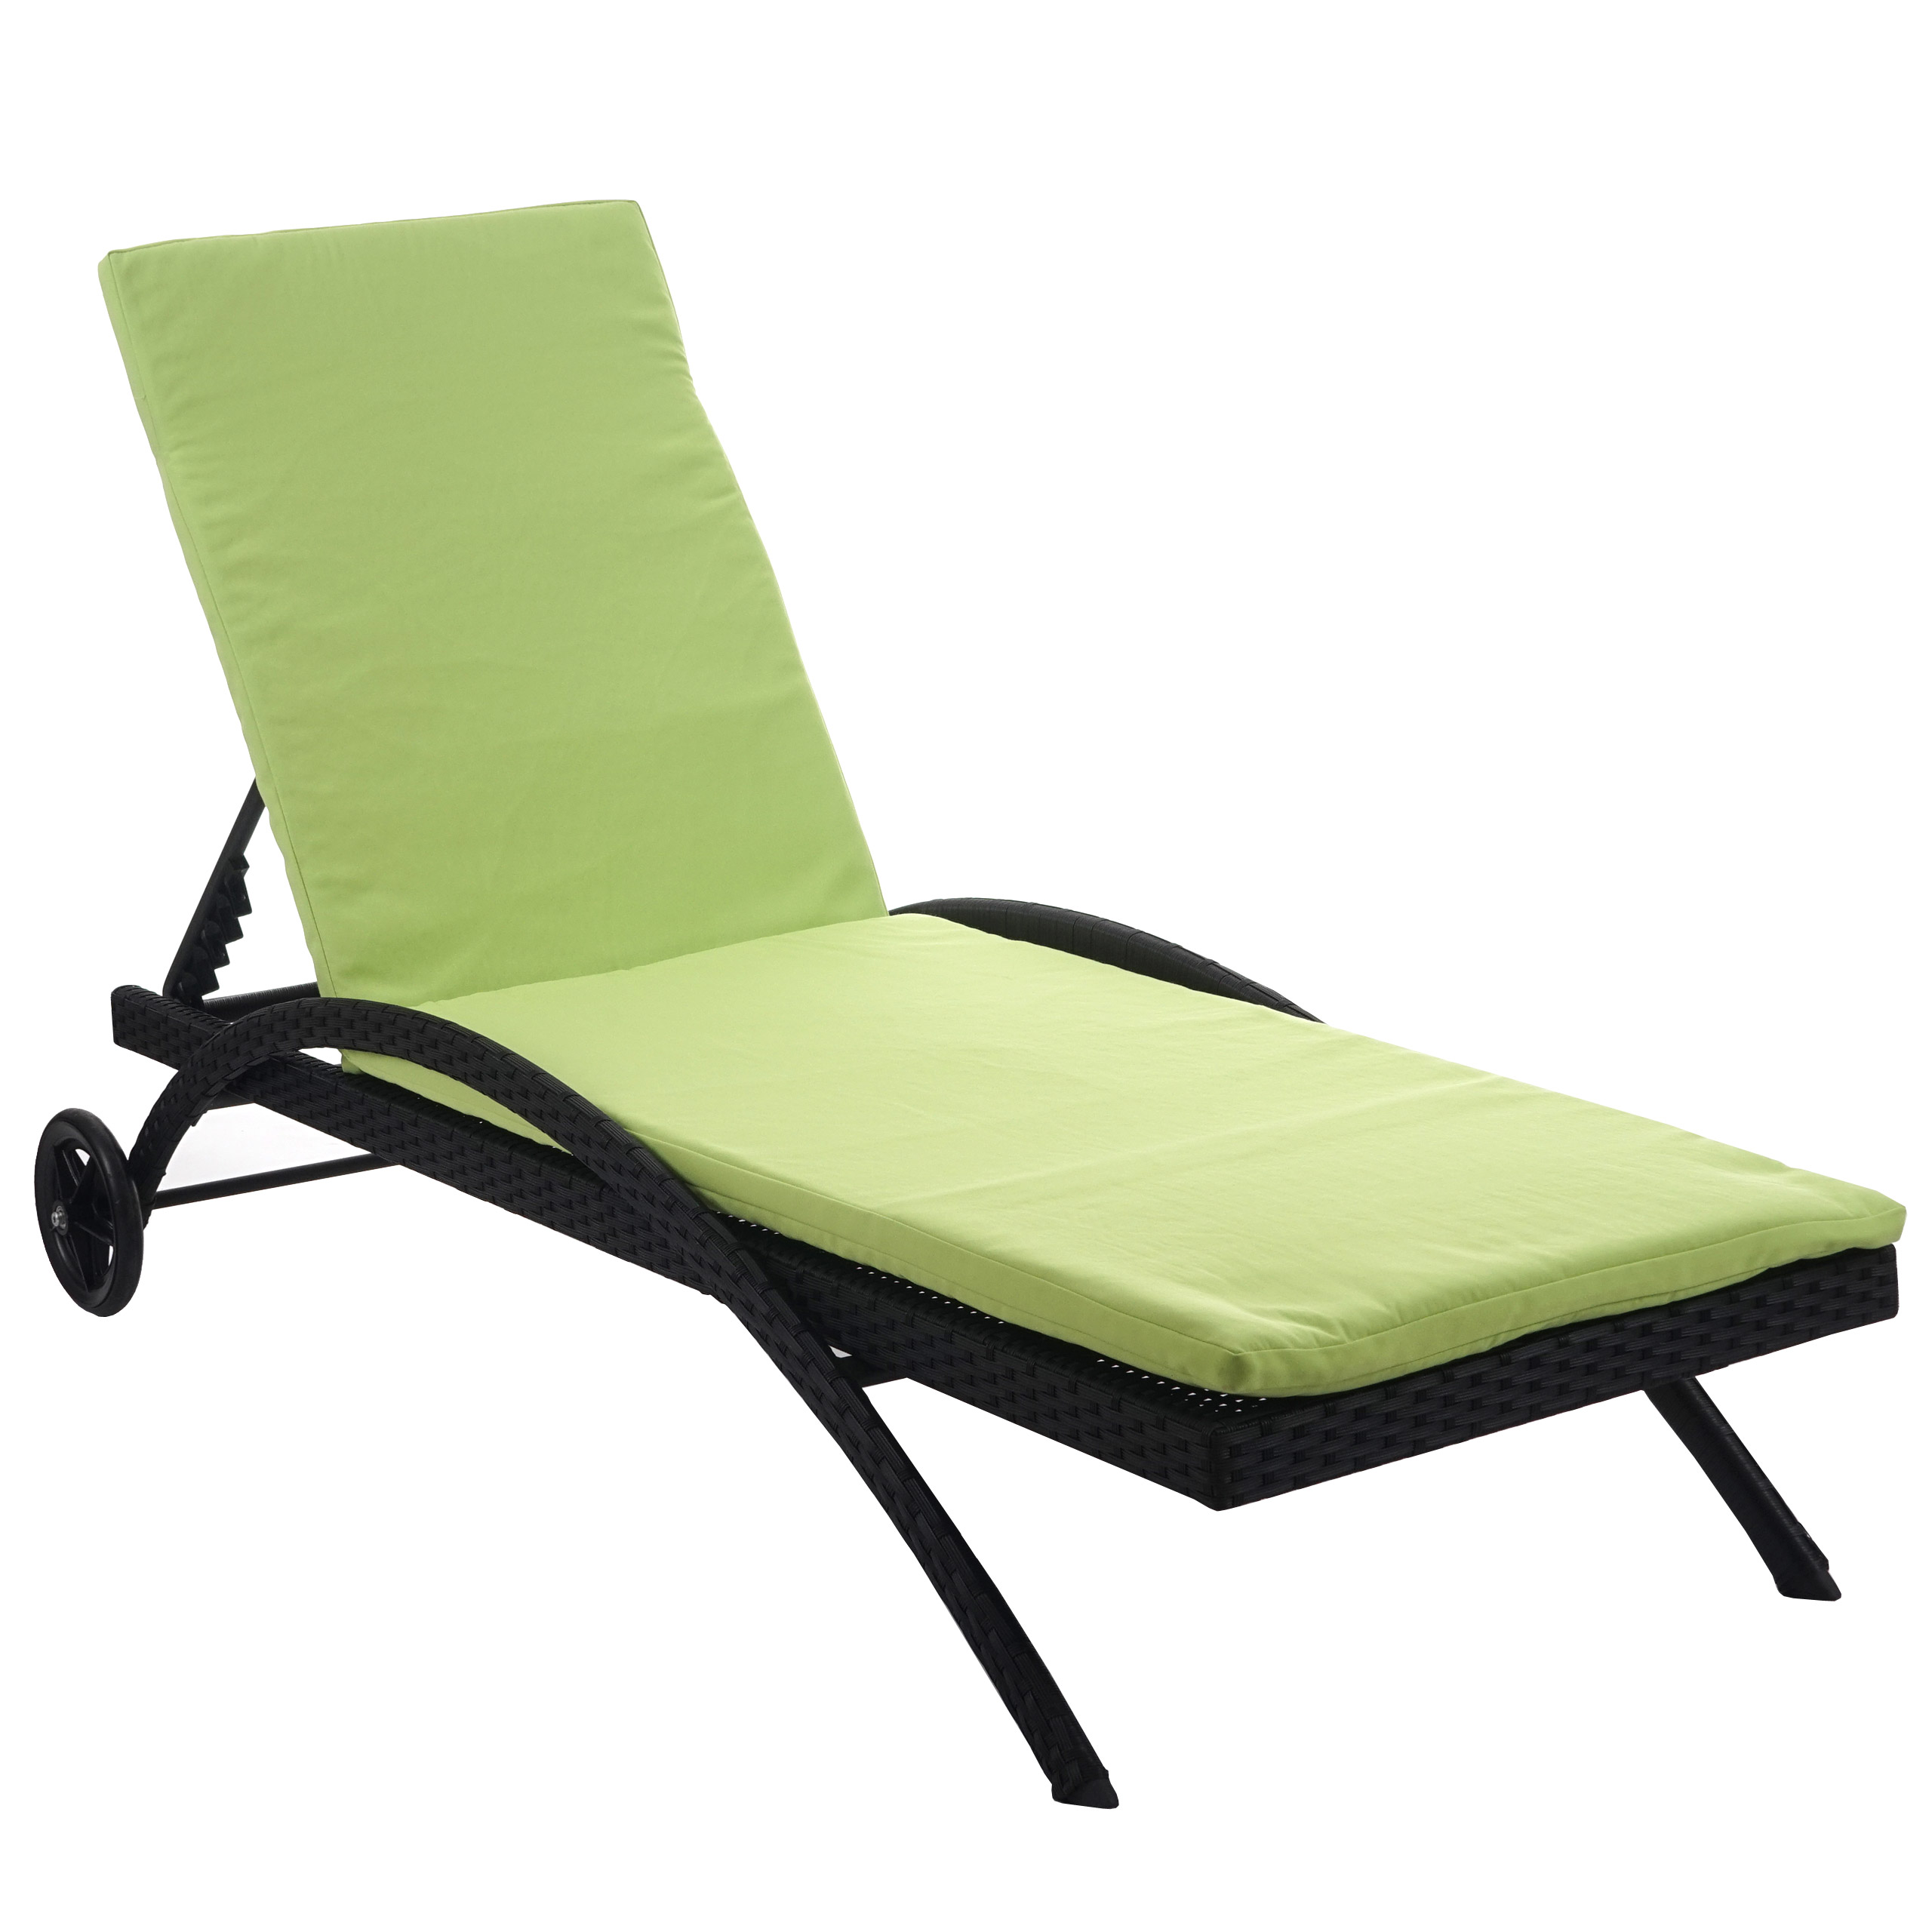 sonnenliege kastoria relaxliege gartenliege poly rattan. Black Bedroom Furniture Sets. Home Design Ideas